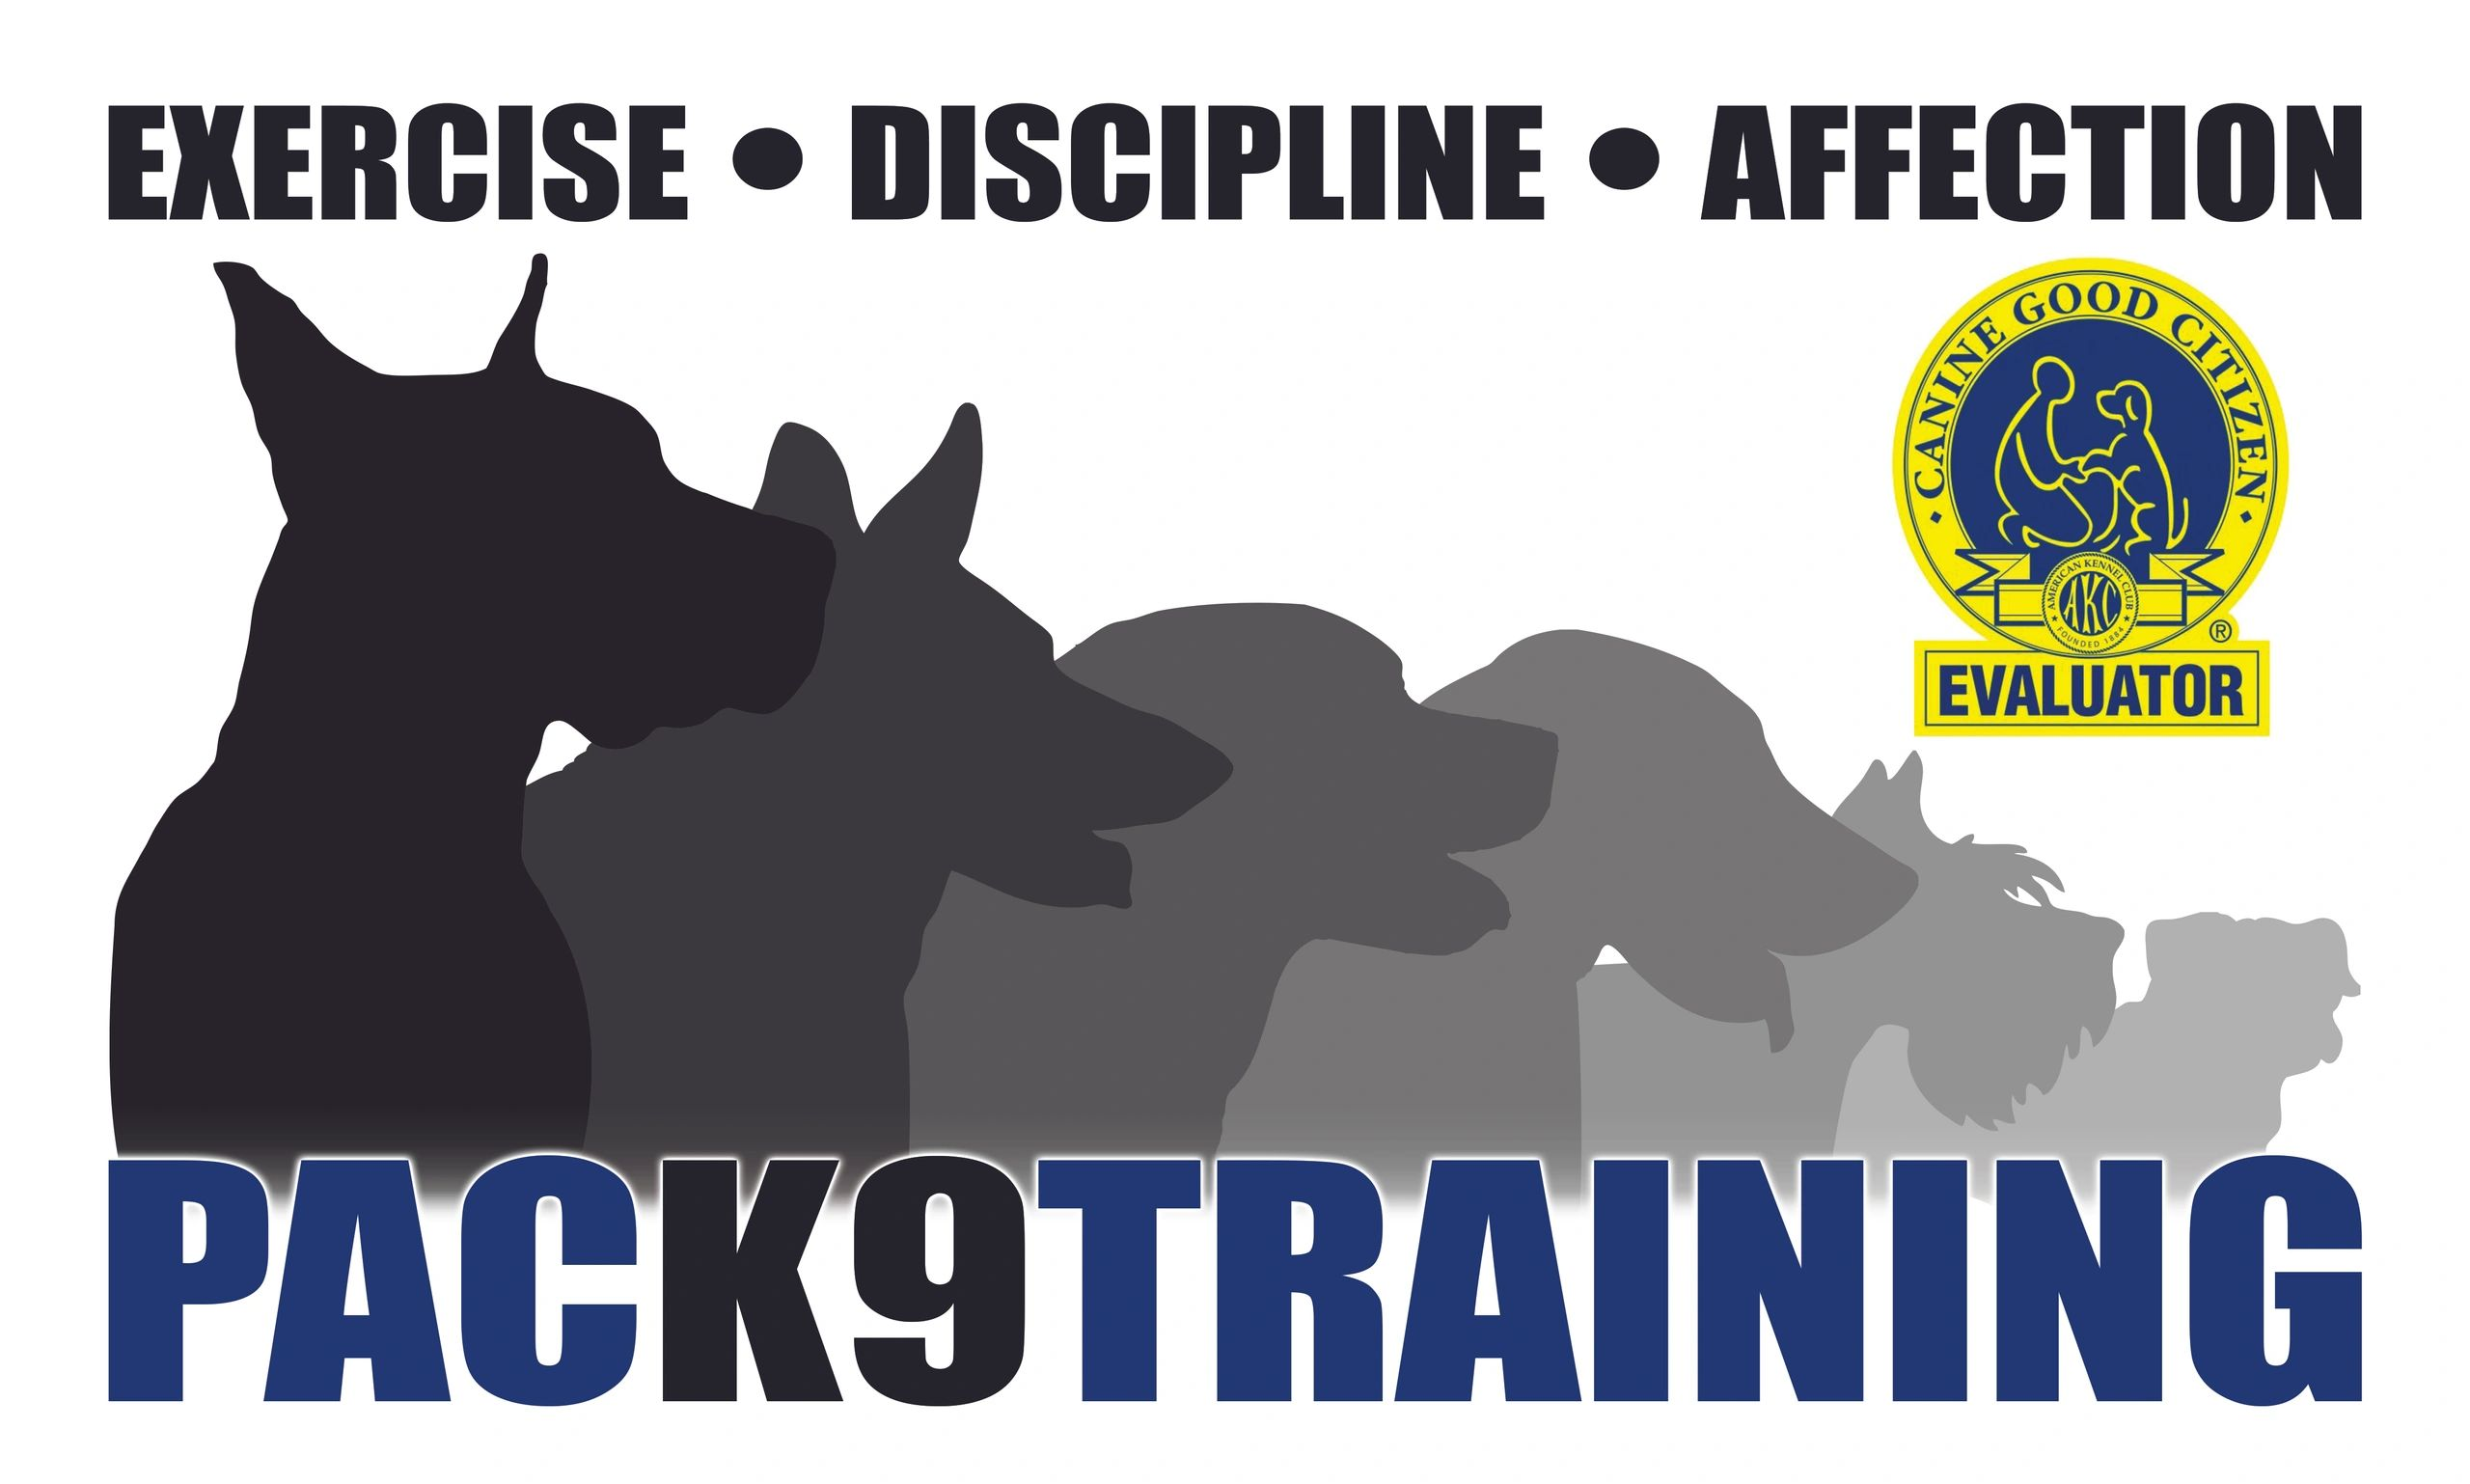 Pack-9 Training LLC logo